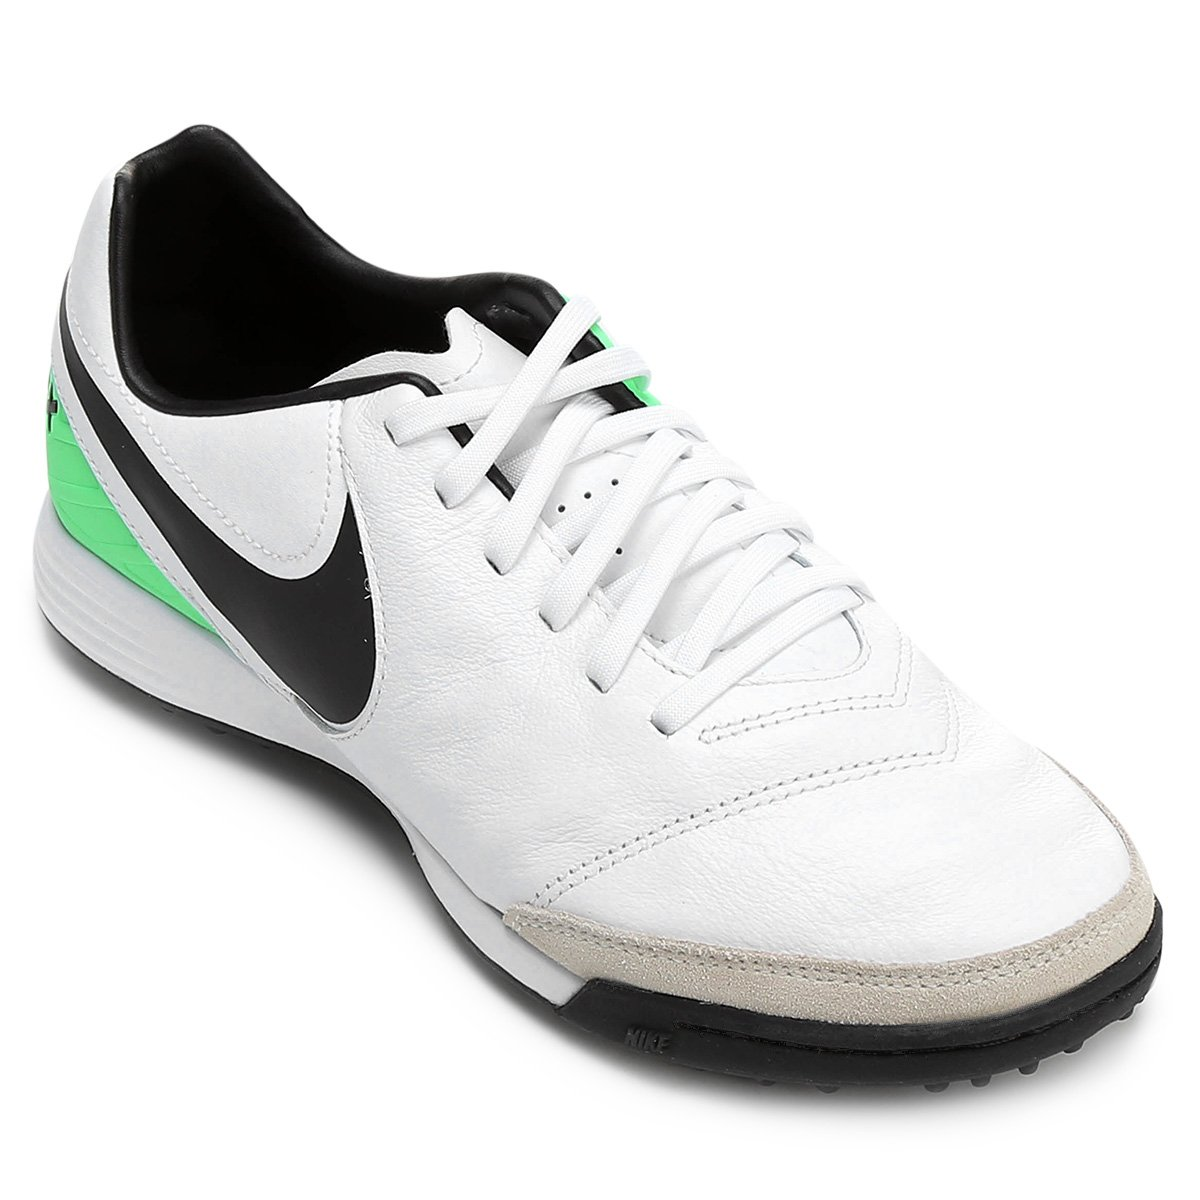 f3abe21368 Chuteira Society Nike Tiempo Mystic 5 TF - Branco e Verde - Compre ...